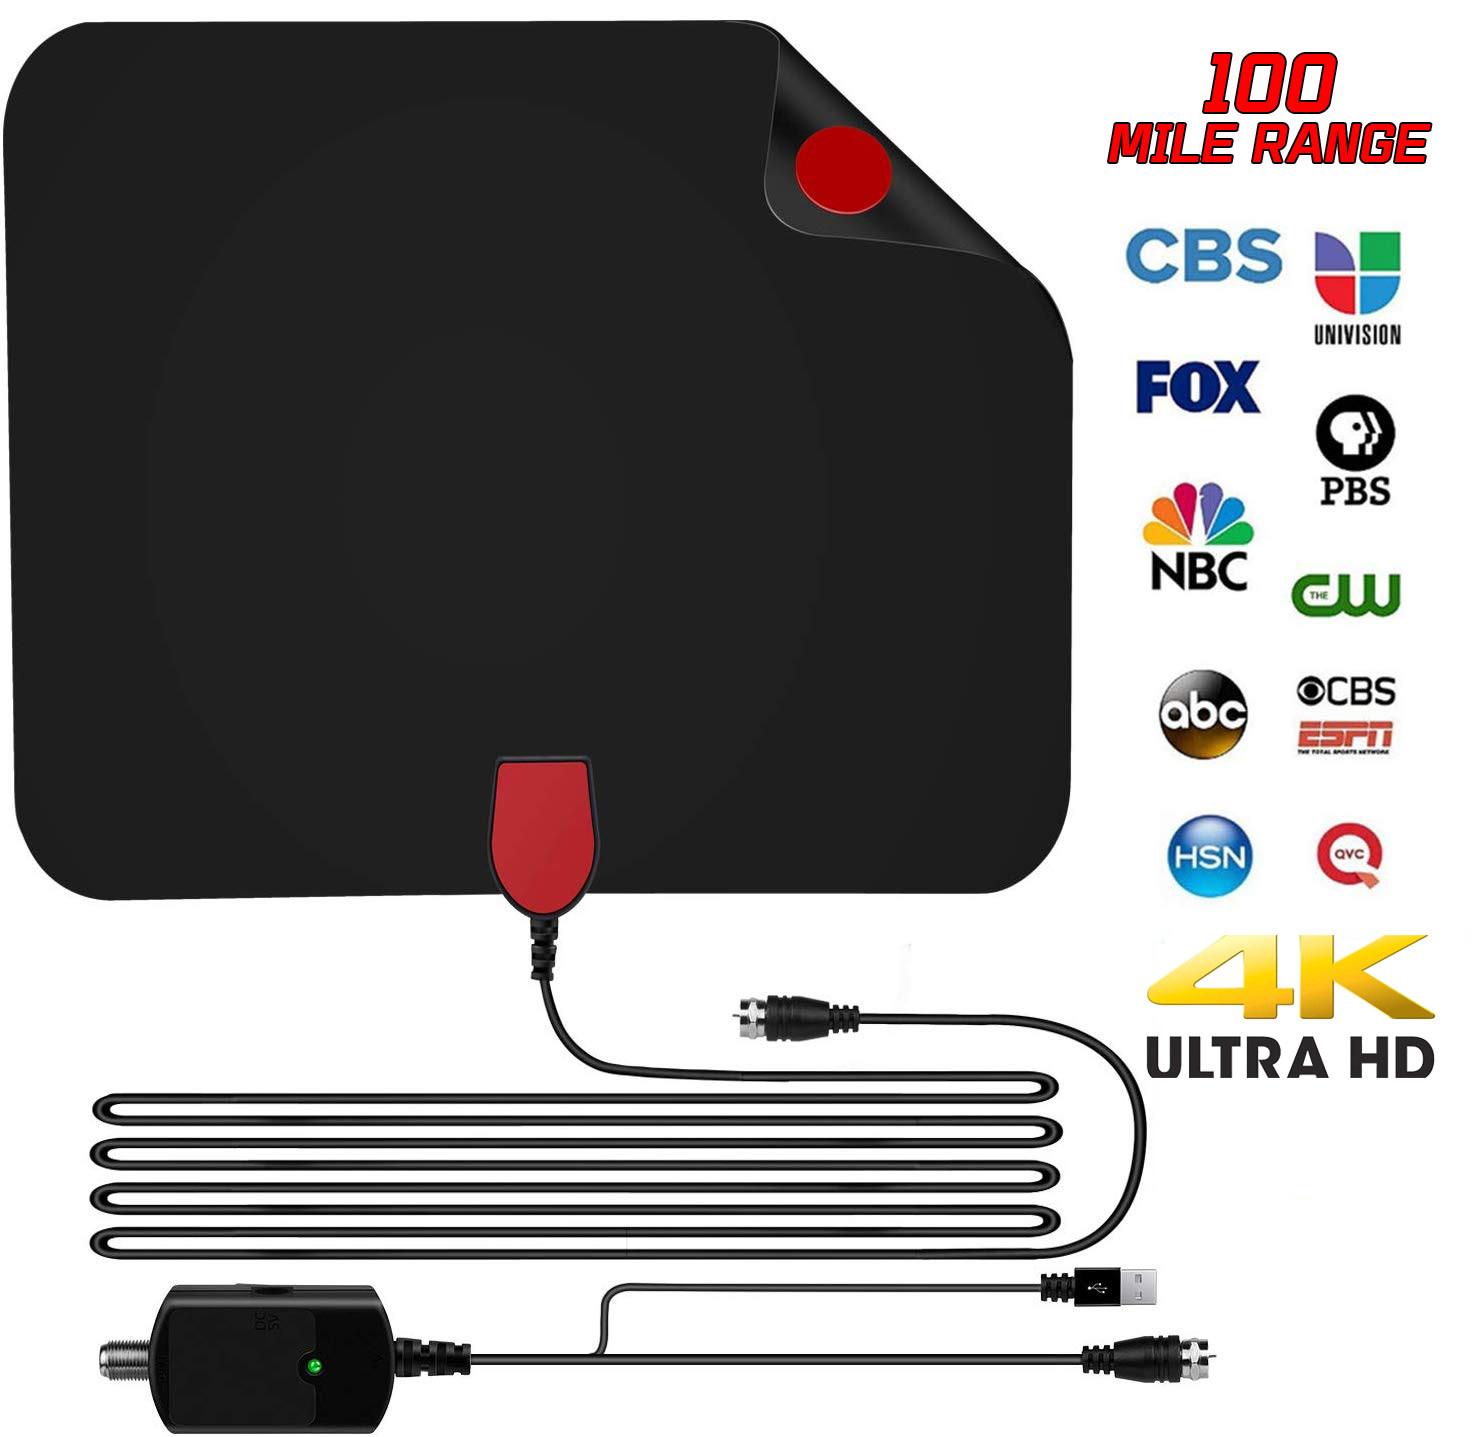 Indoor TV Antenna Digital HDTV Aerial Amplified 100 Mile Range VHF UHF Freeview